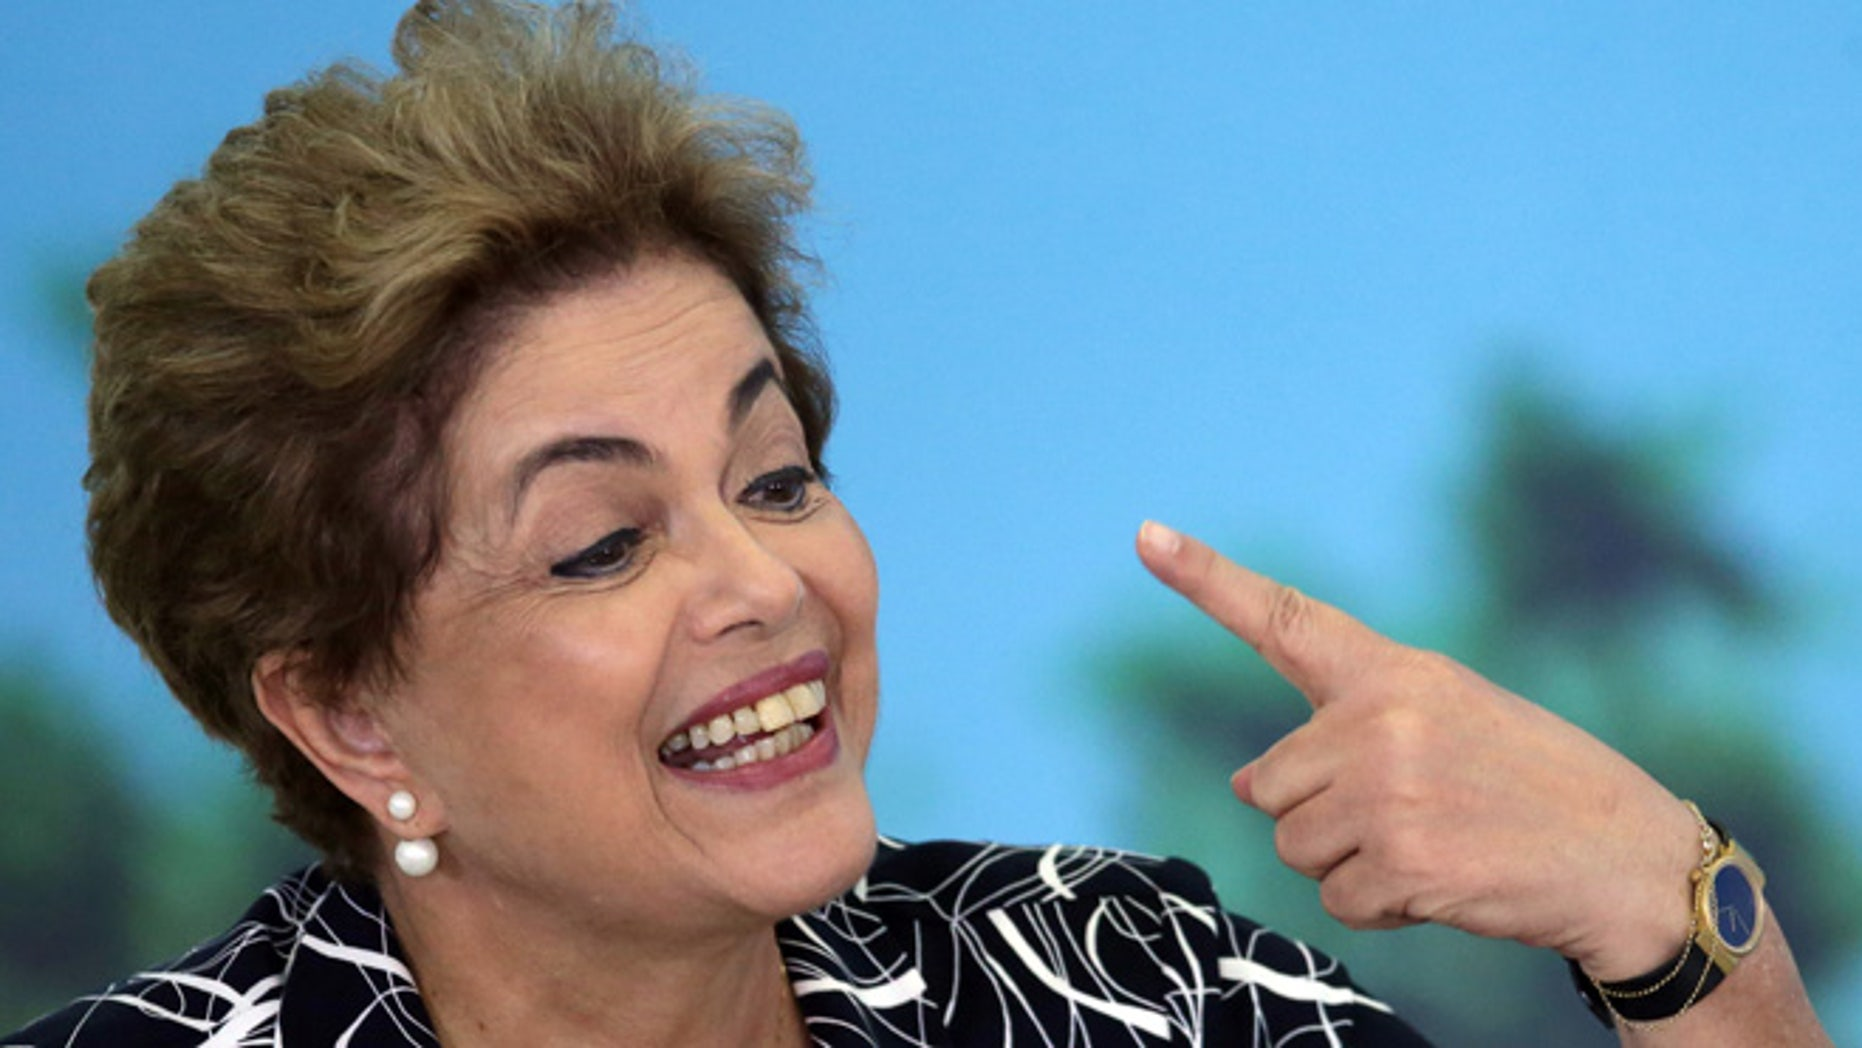 Brazil's President Dilma Rousseff at Planalto presidential palace in Brasilia, Brazil, Friday, May 6, 2016.